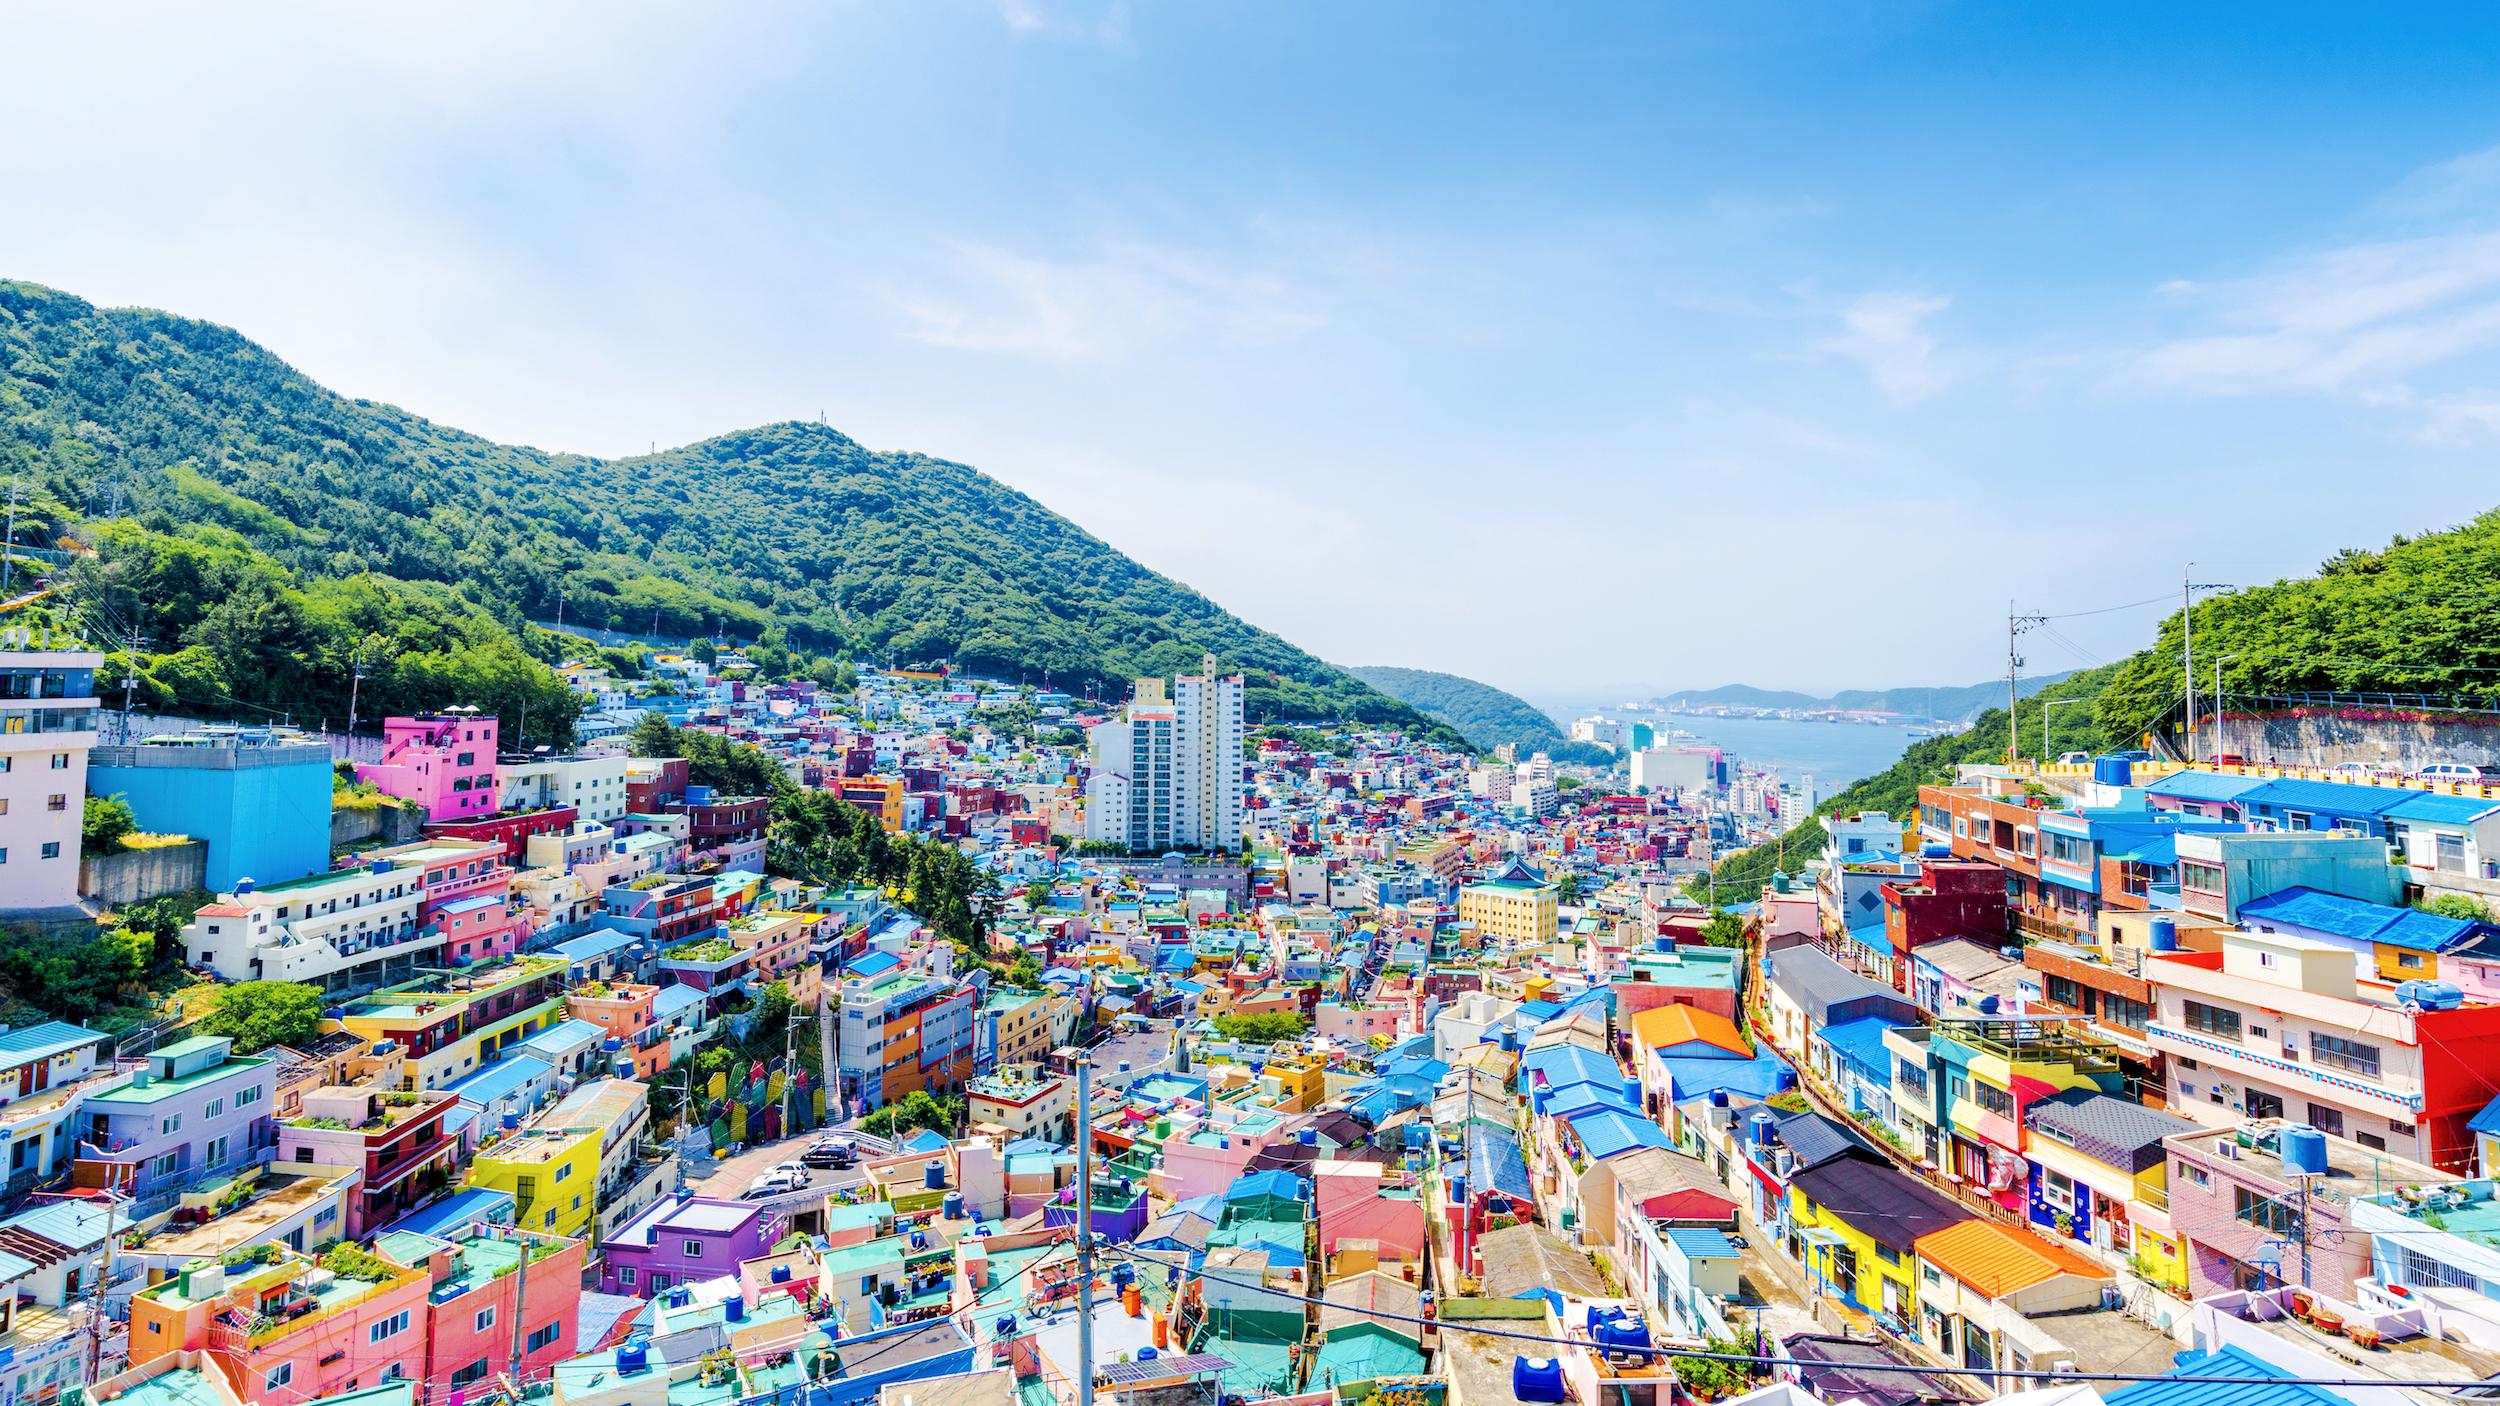 Gamcheon Culture Village Busan - Coree du Sud